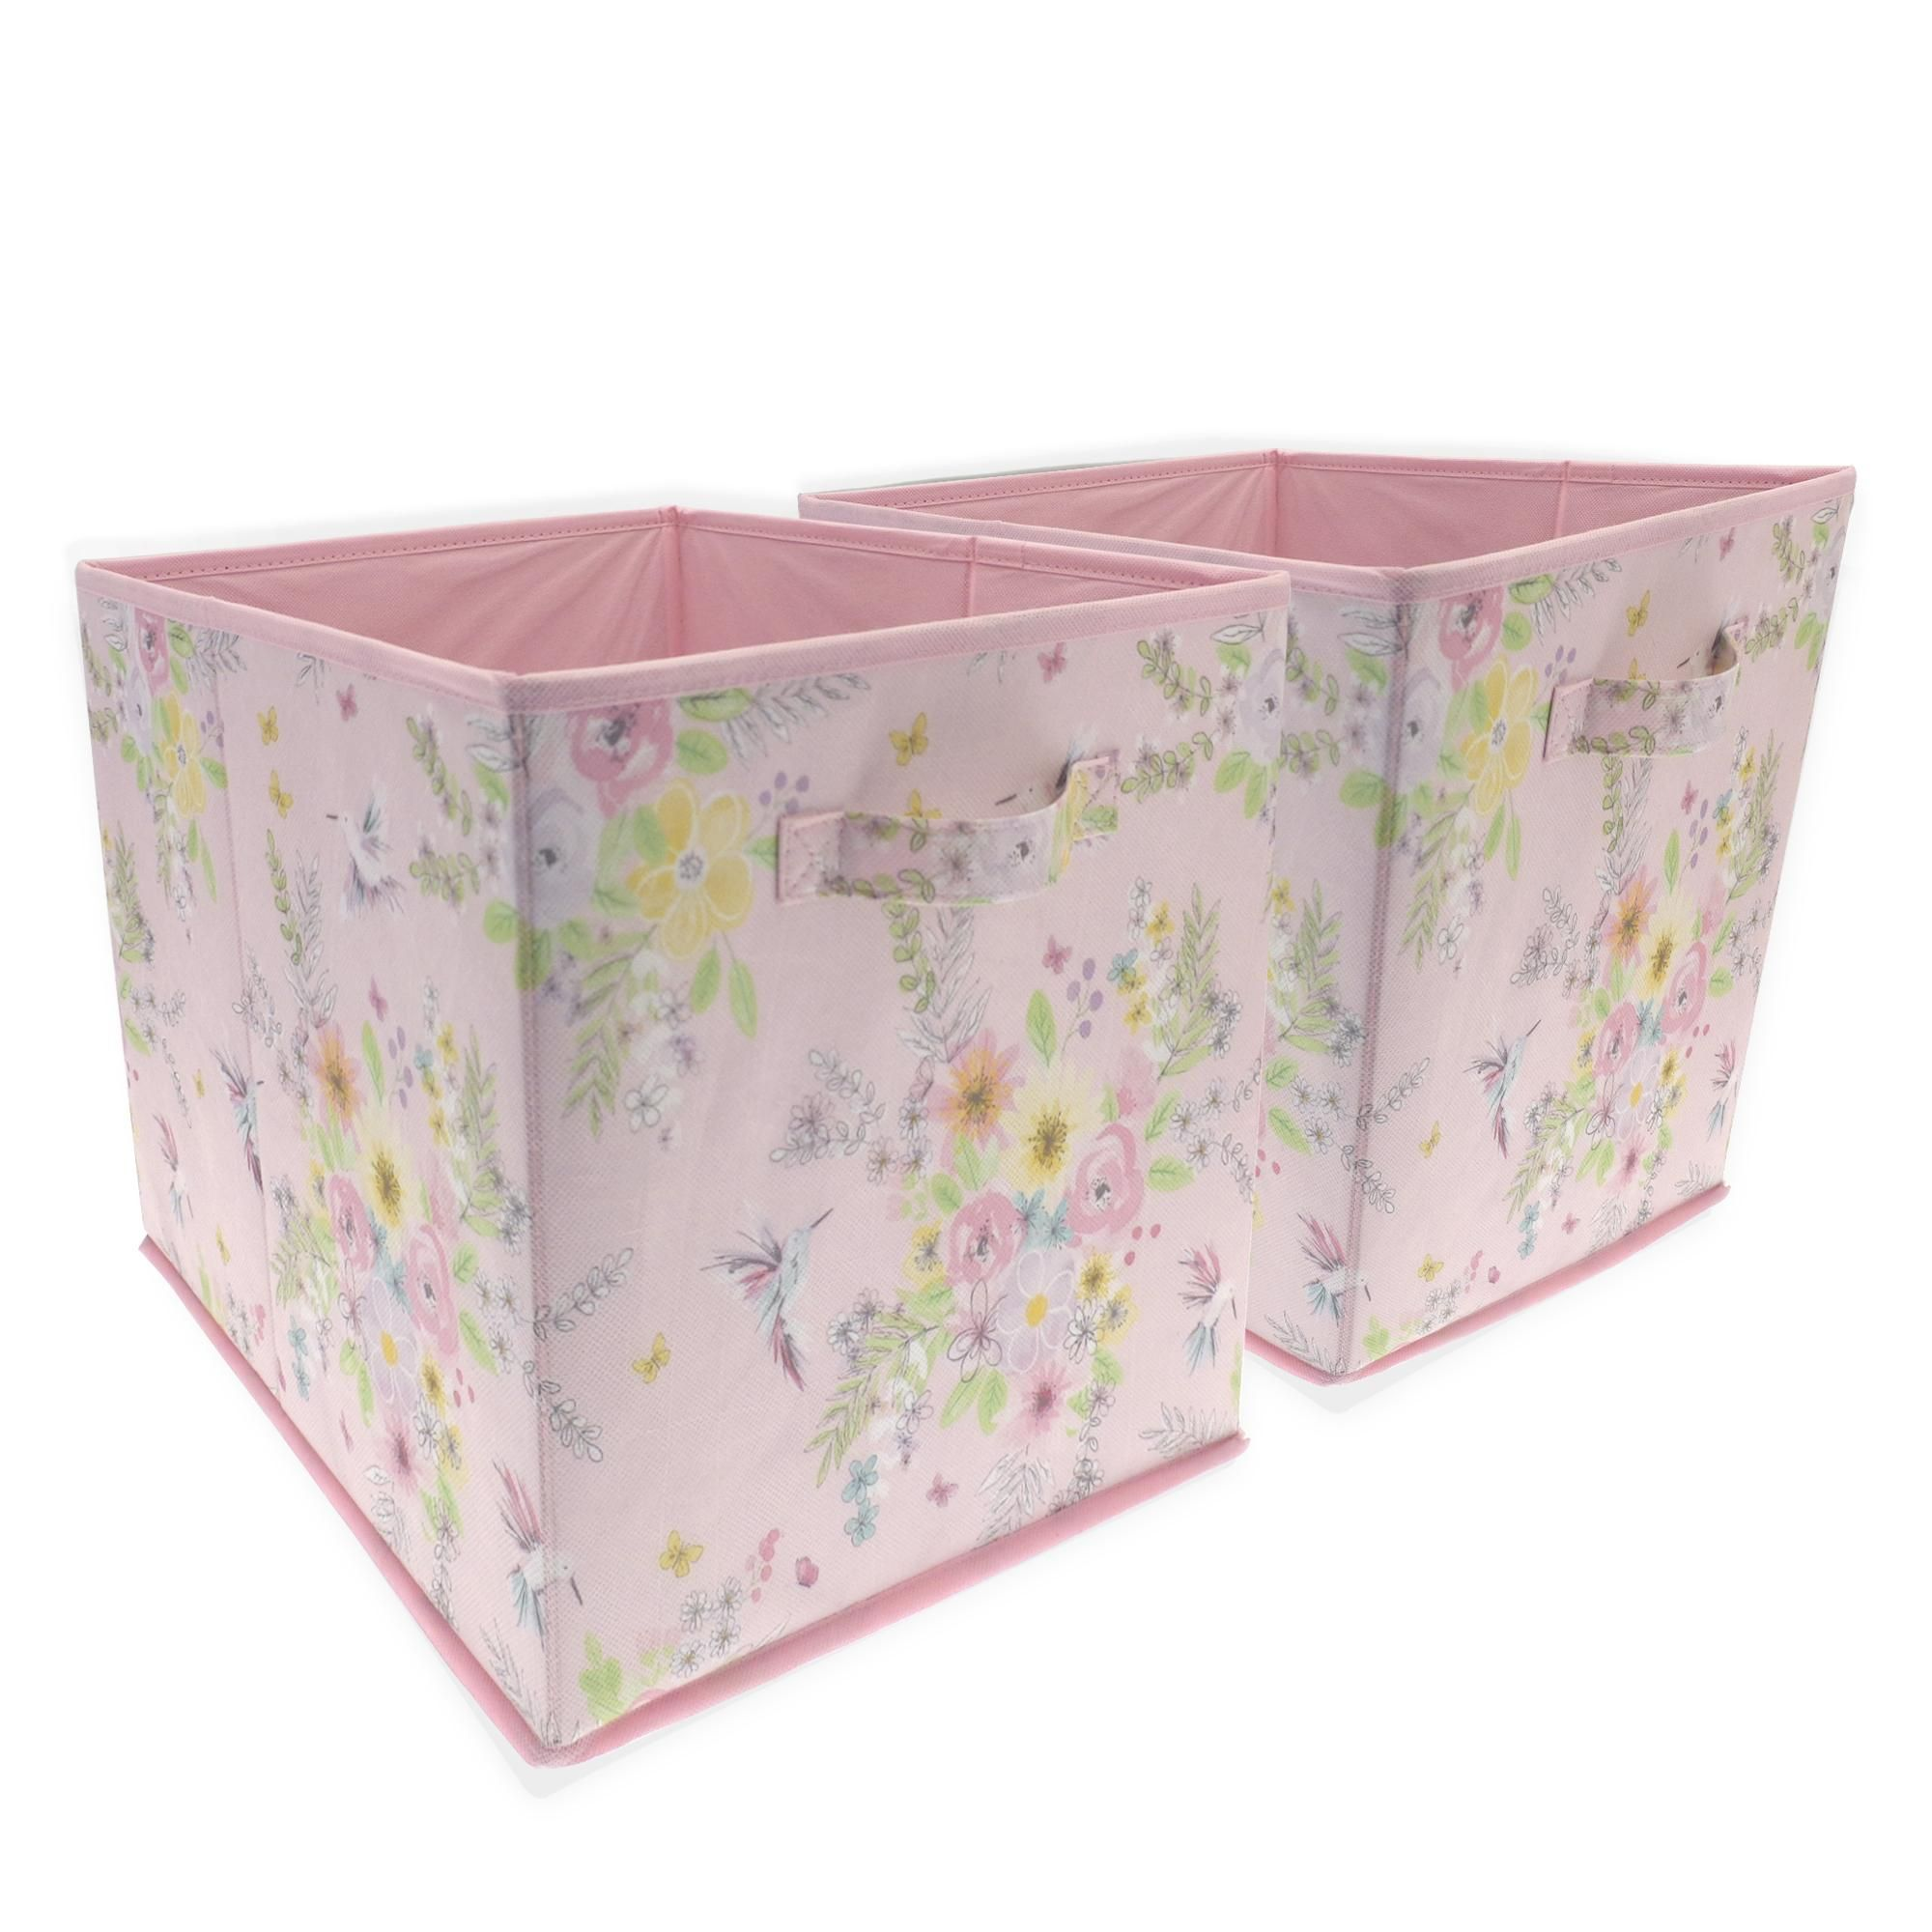 Dunelm Pink Little Hummingbirds Pack Of 2 Storage Cubes Cube